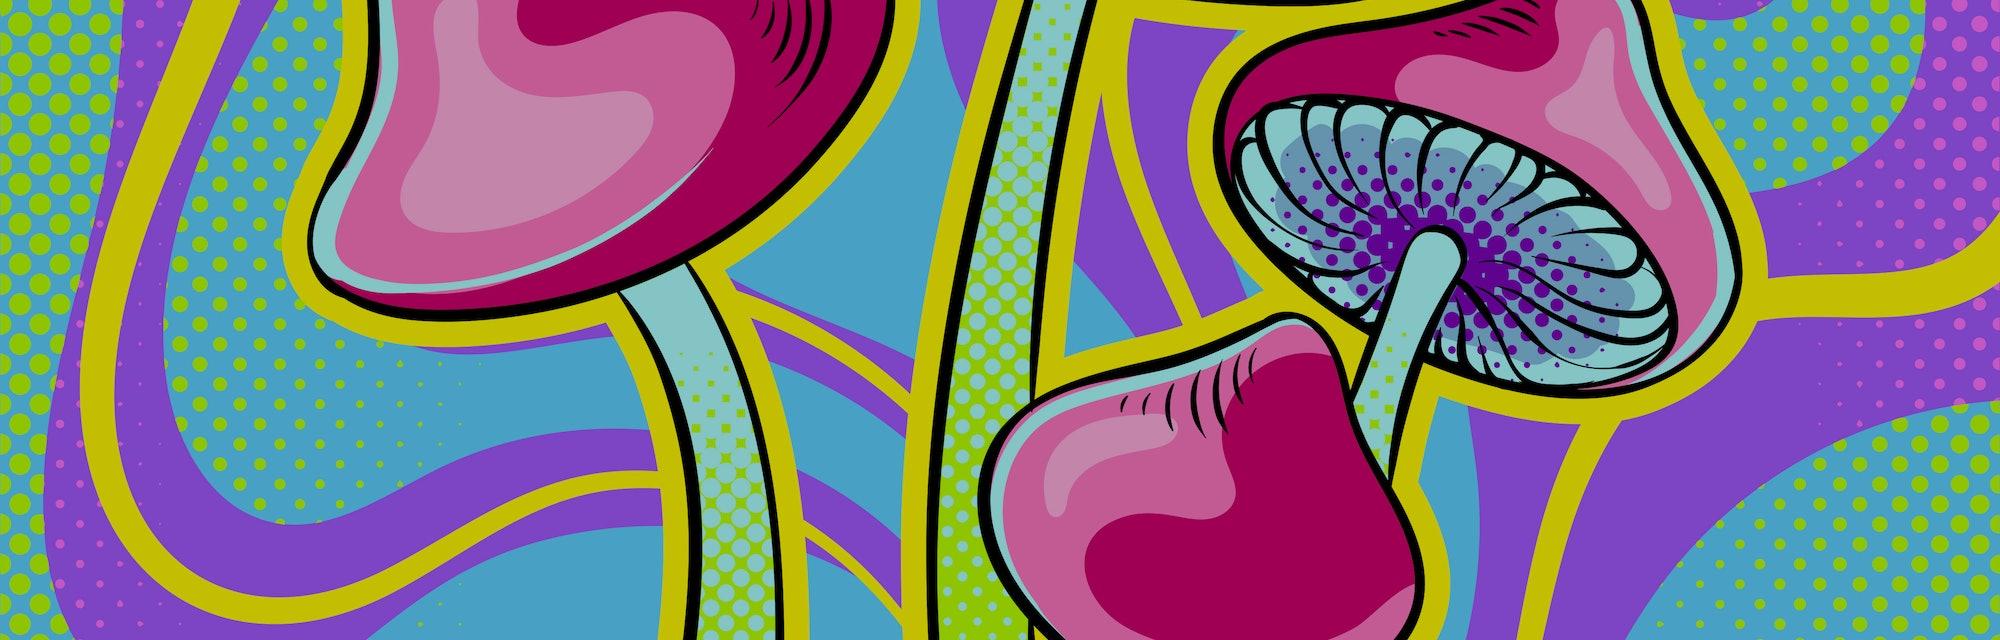 Narcotic psychodelic mushroom psilocybin pop art retro vector illustration. Comic book style imitation.